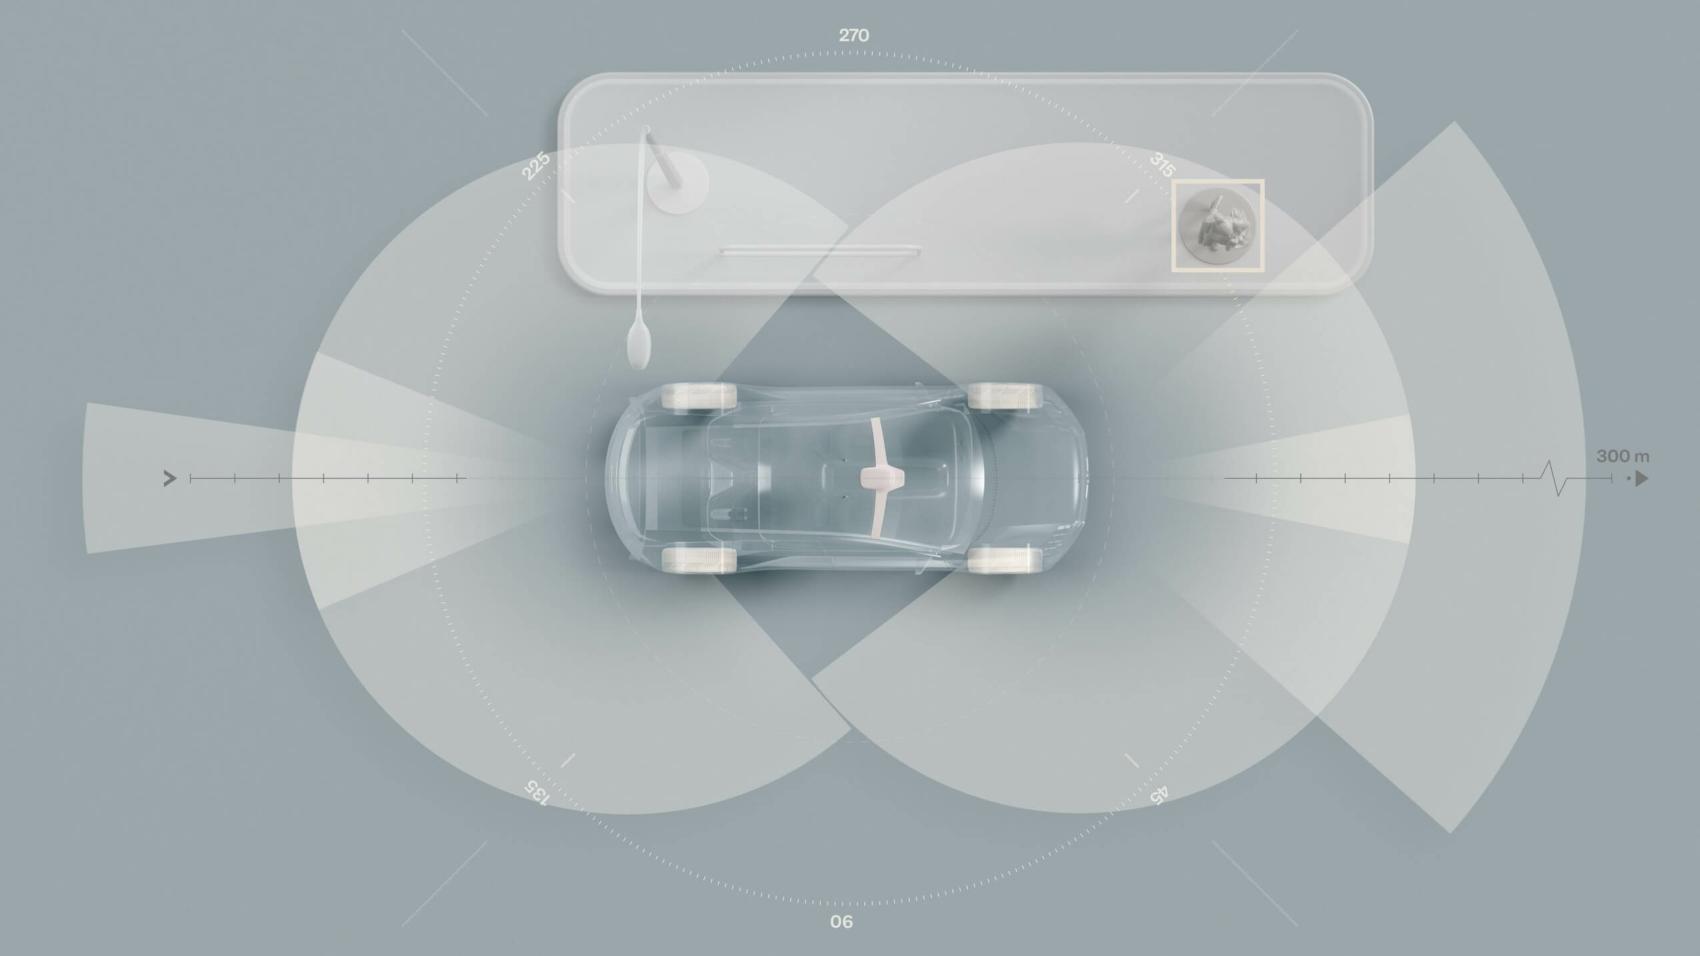 2023 Volvo XC90 teaser